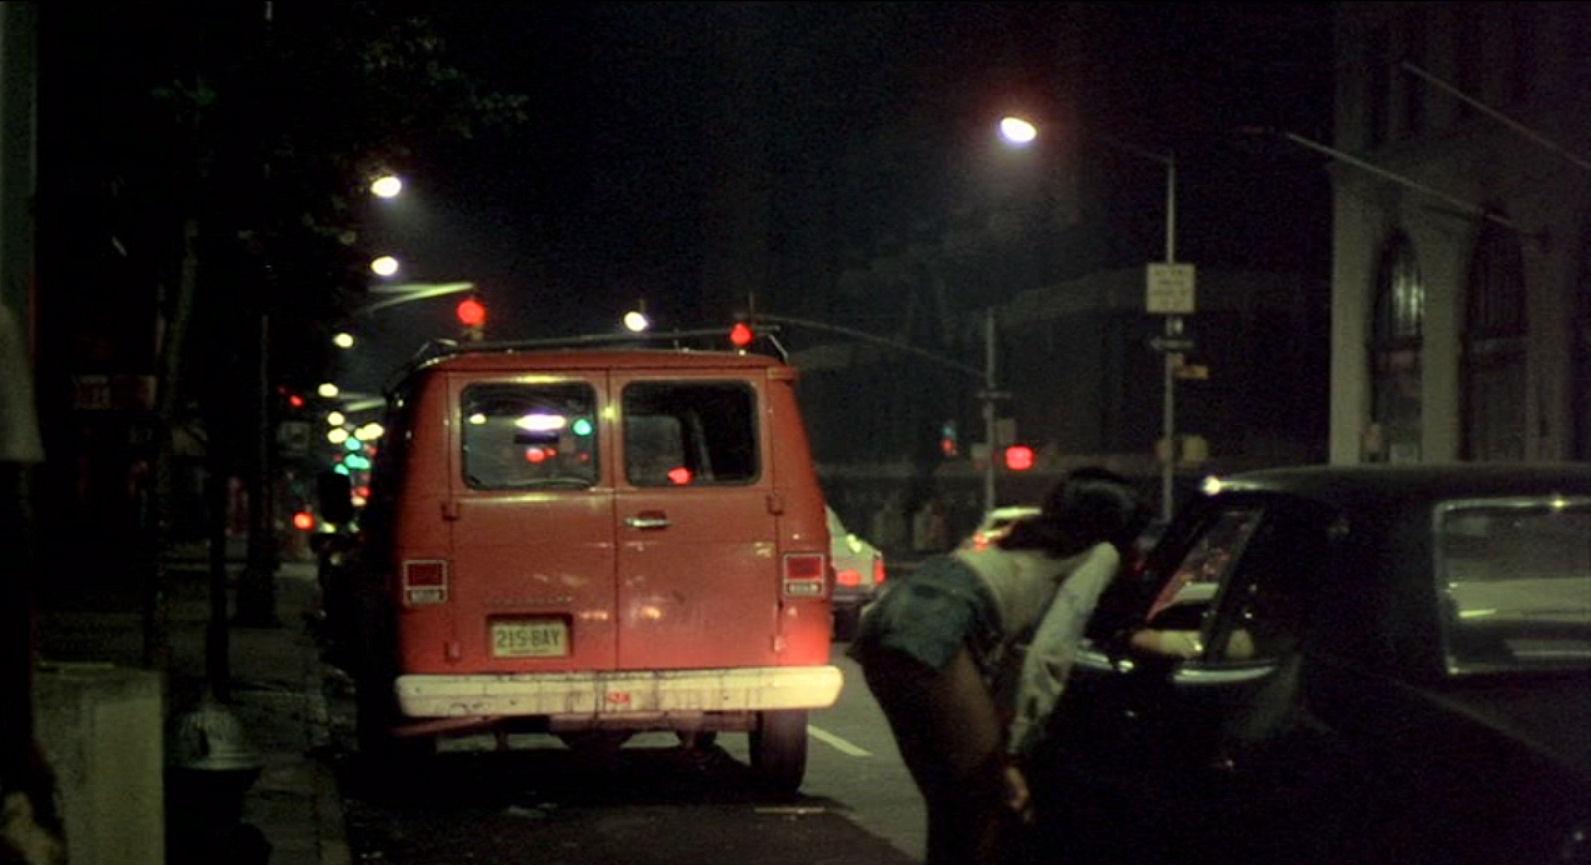 The Film Noir: Taxi Driver (1976) New York